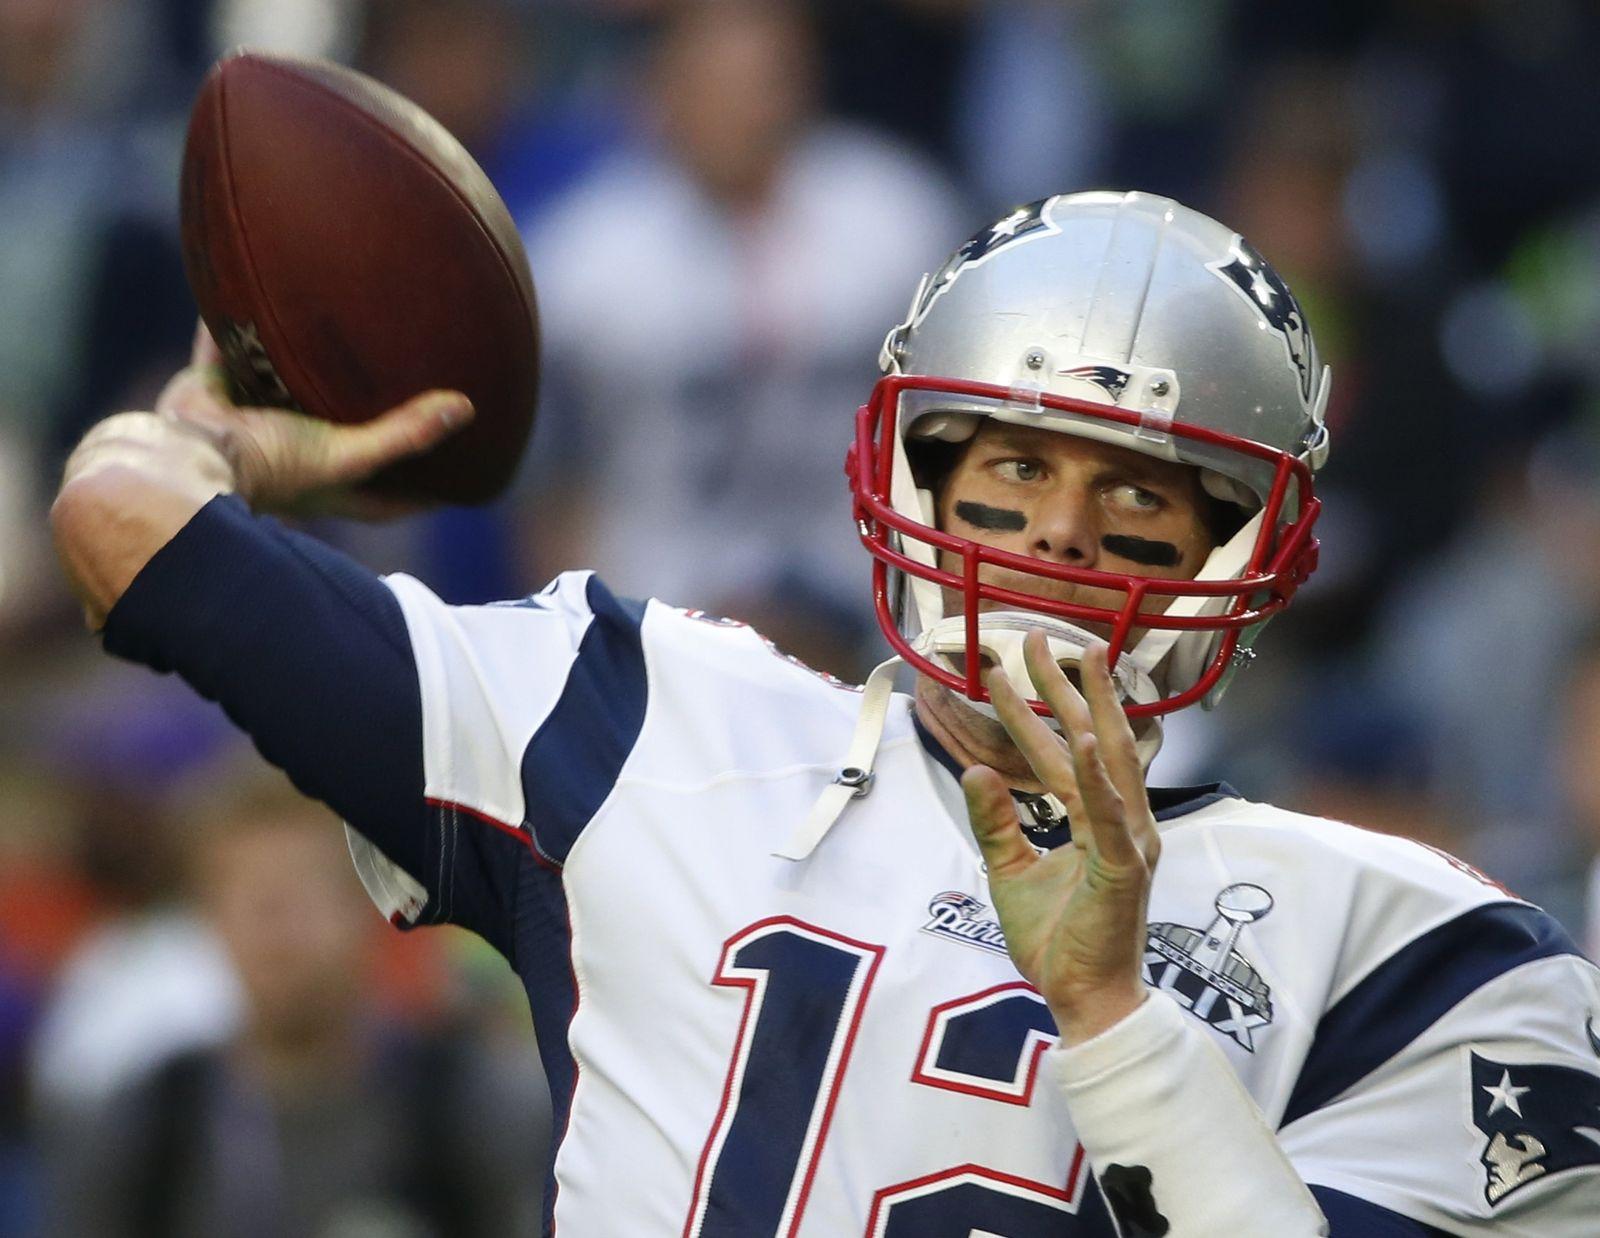 US-NFL-DEFLATE-REPORT